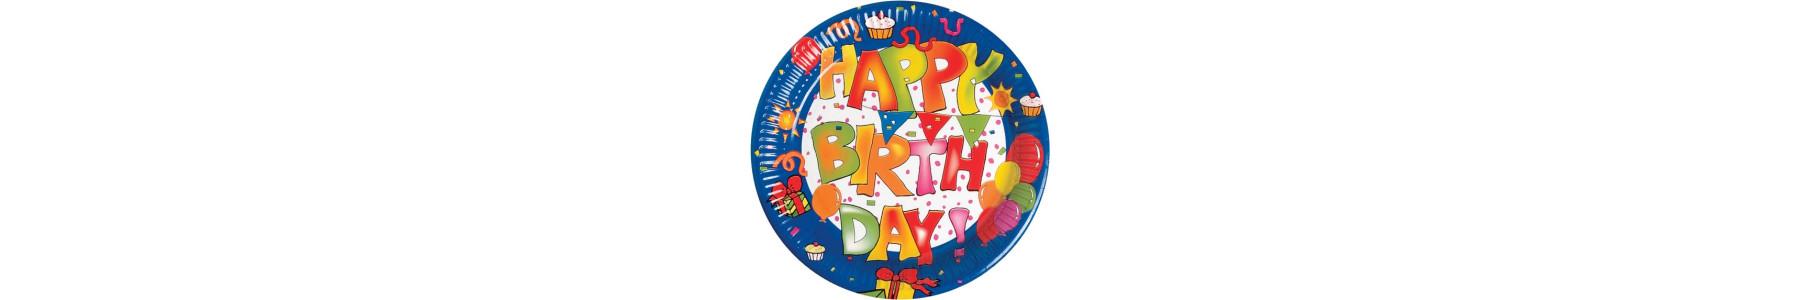 Colectia articole party Happy Birthday Kokliko